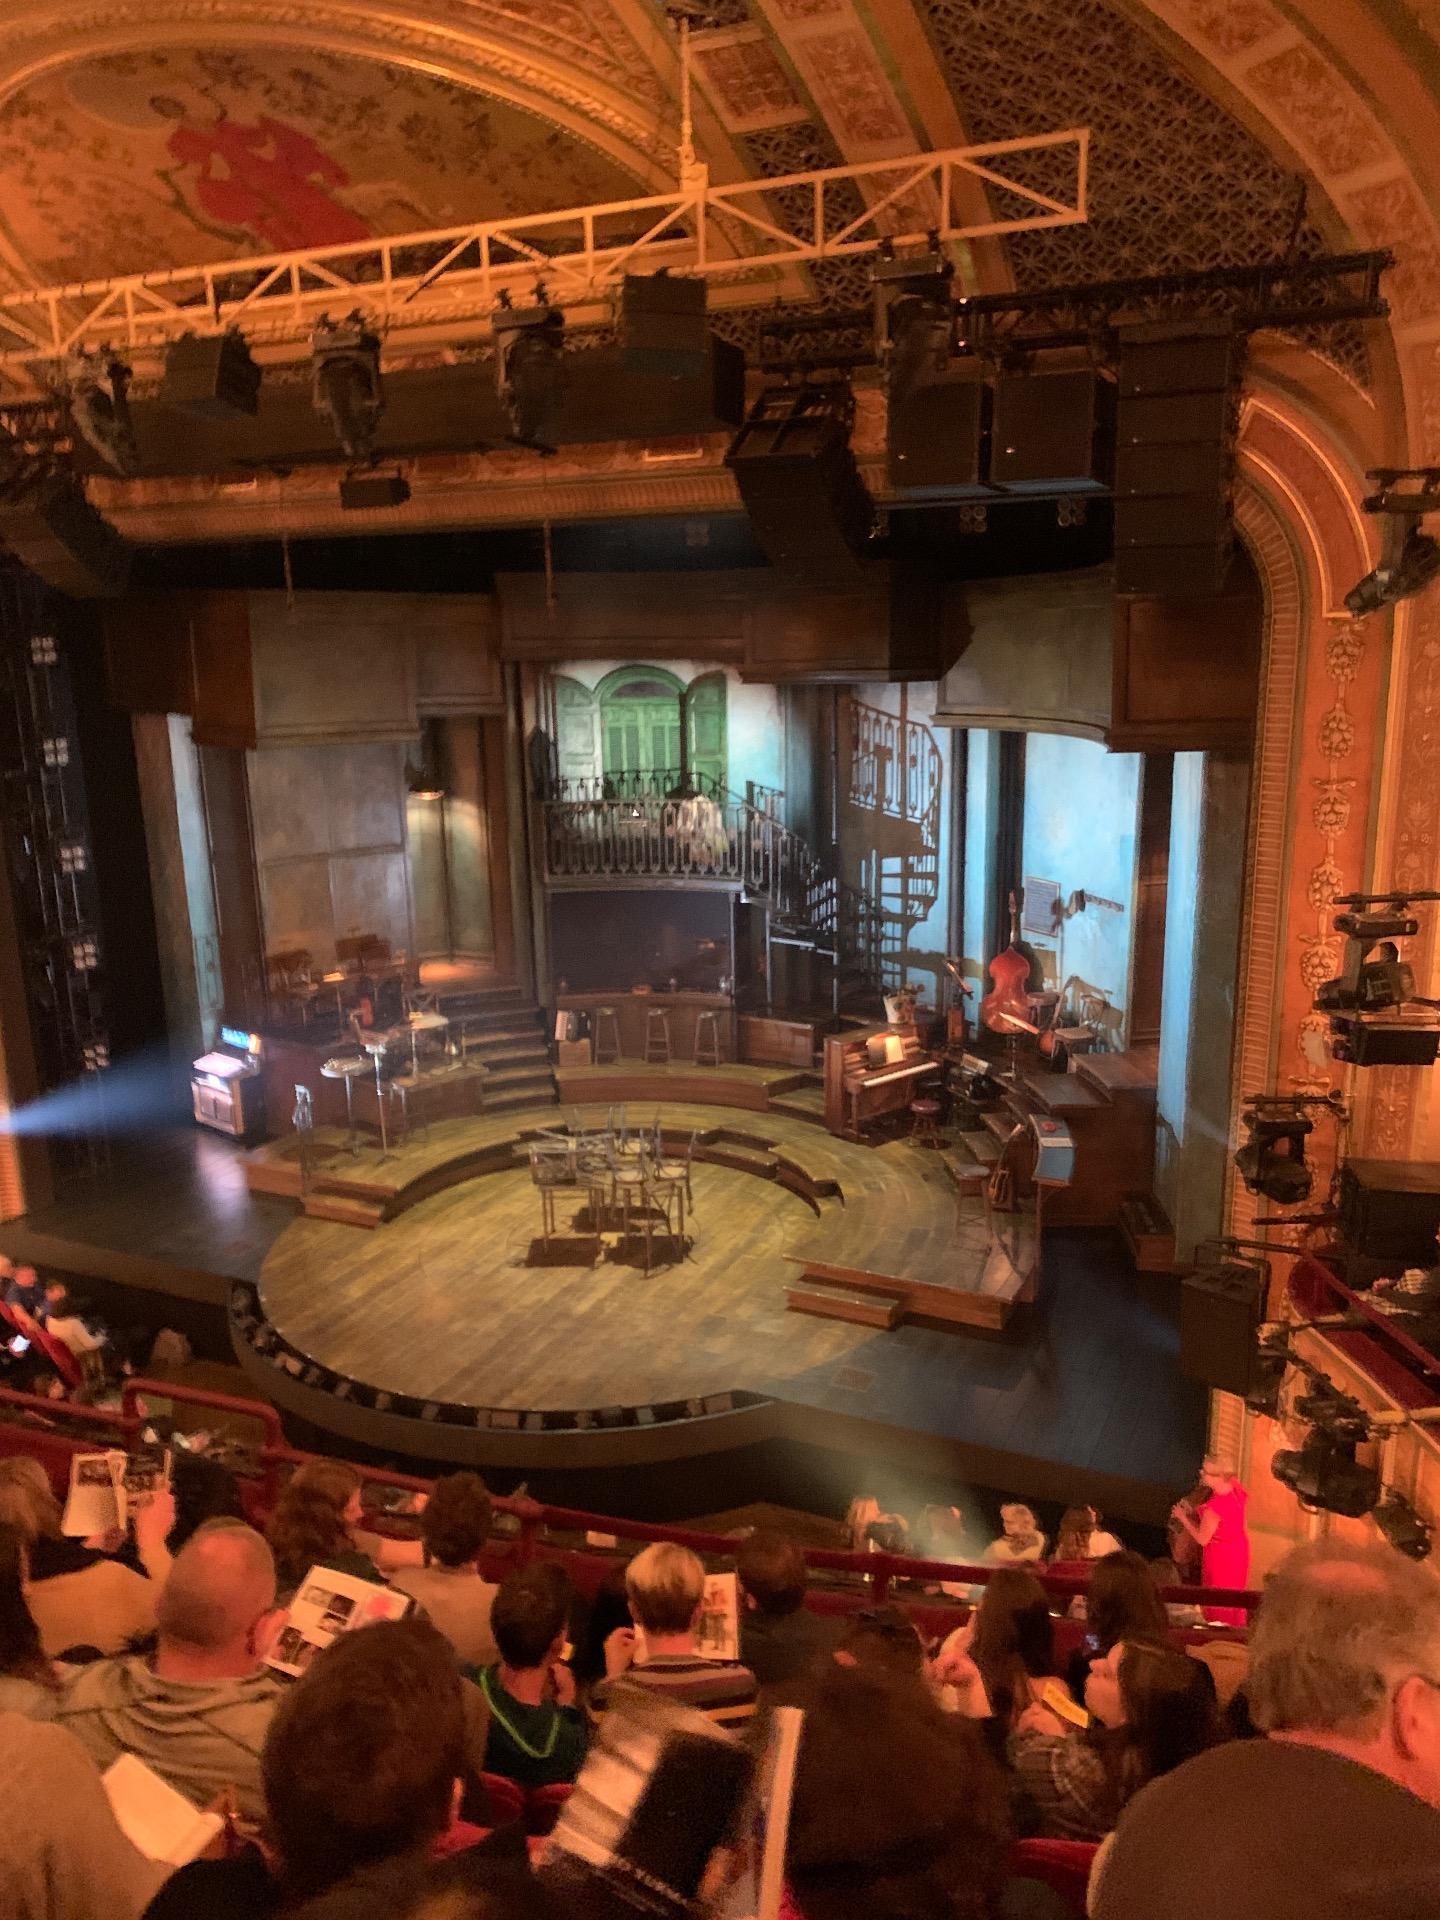 Walter Kerr Theatre Section Mezzanine R Row F Seat 14